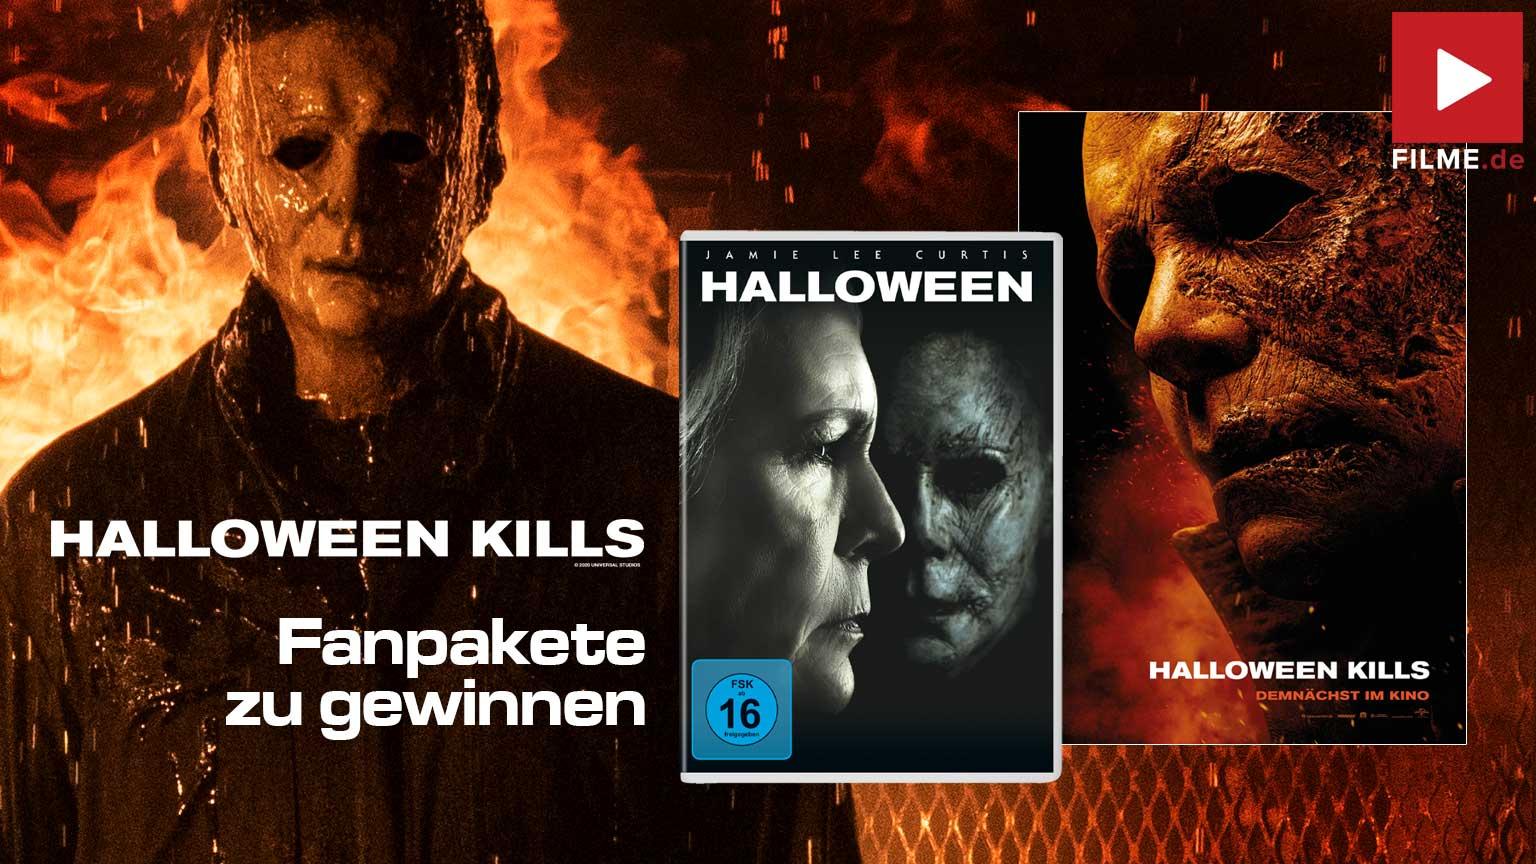 Halloween Kills Film 2021 Gewinnspiel gewinnen Fanpaket Film 2018 Poster Artikelbild